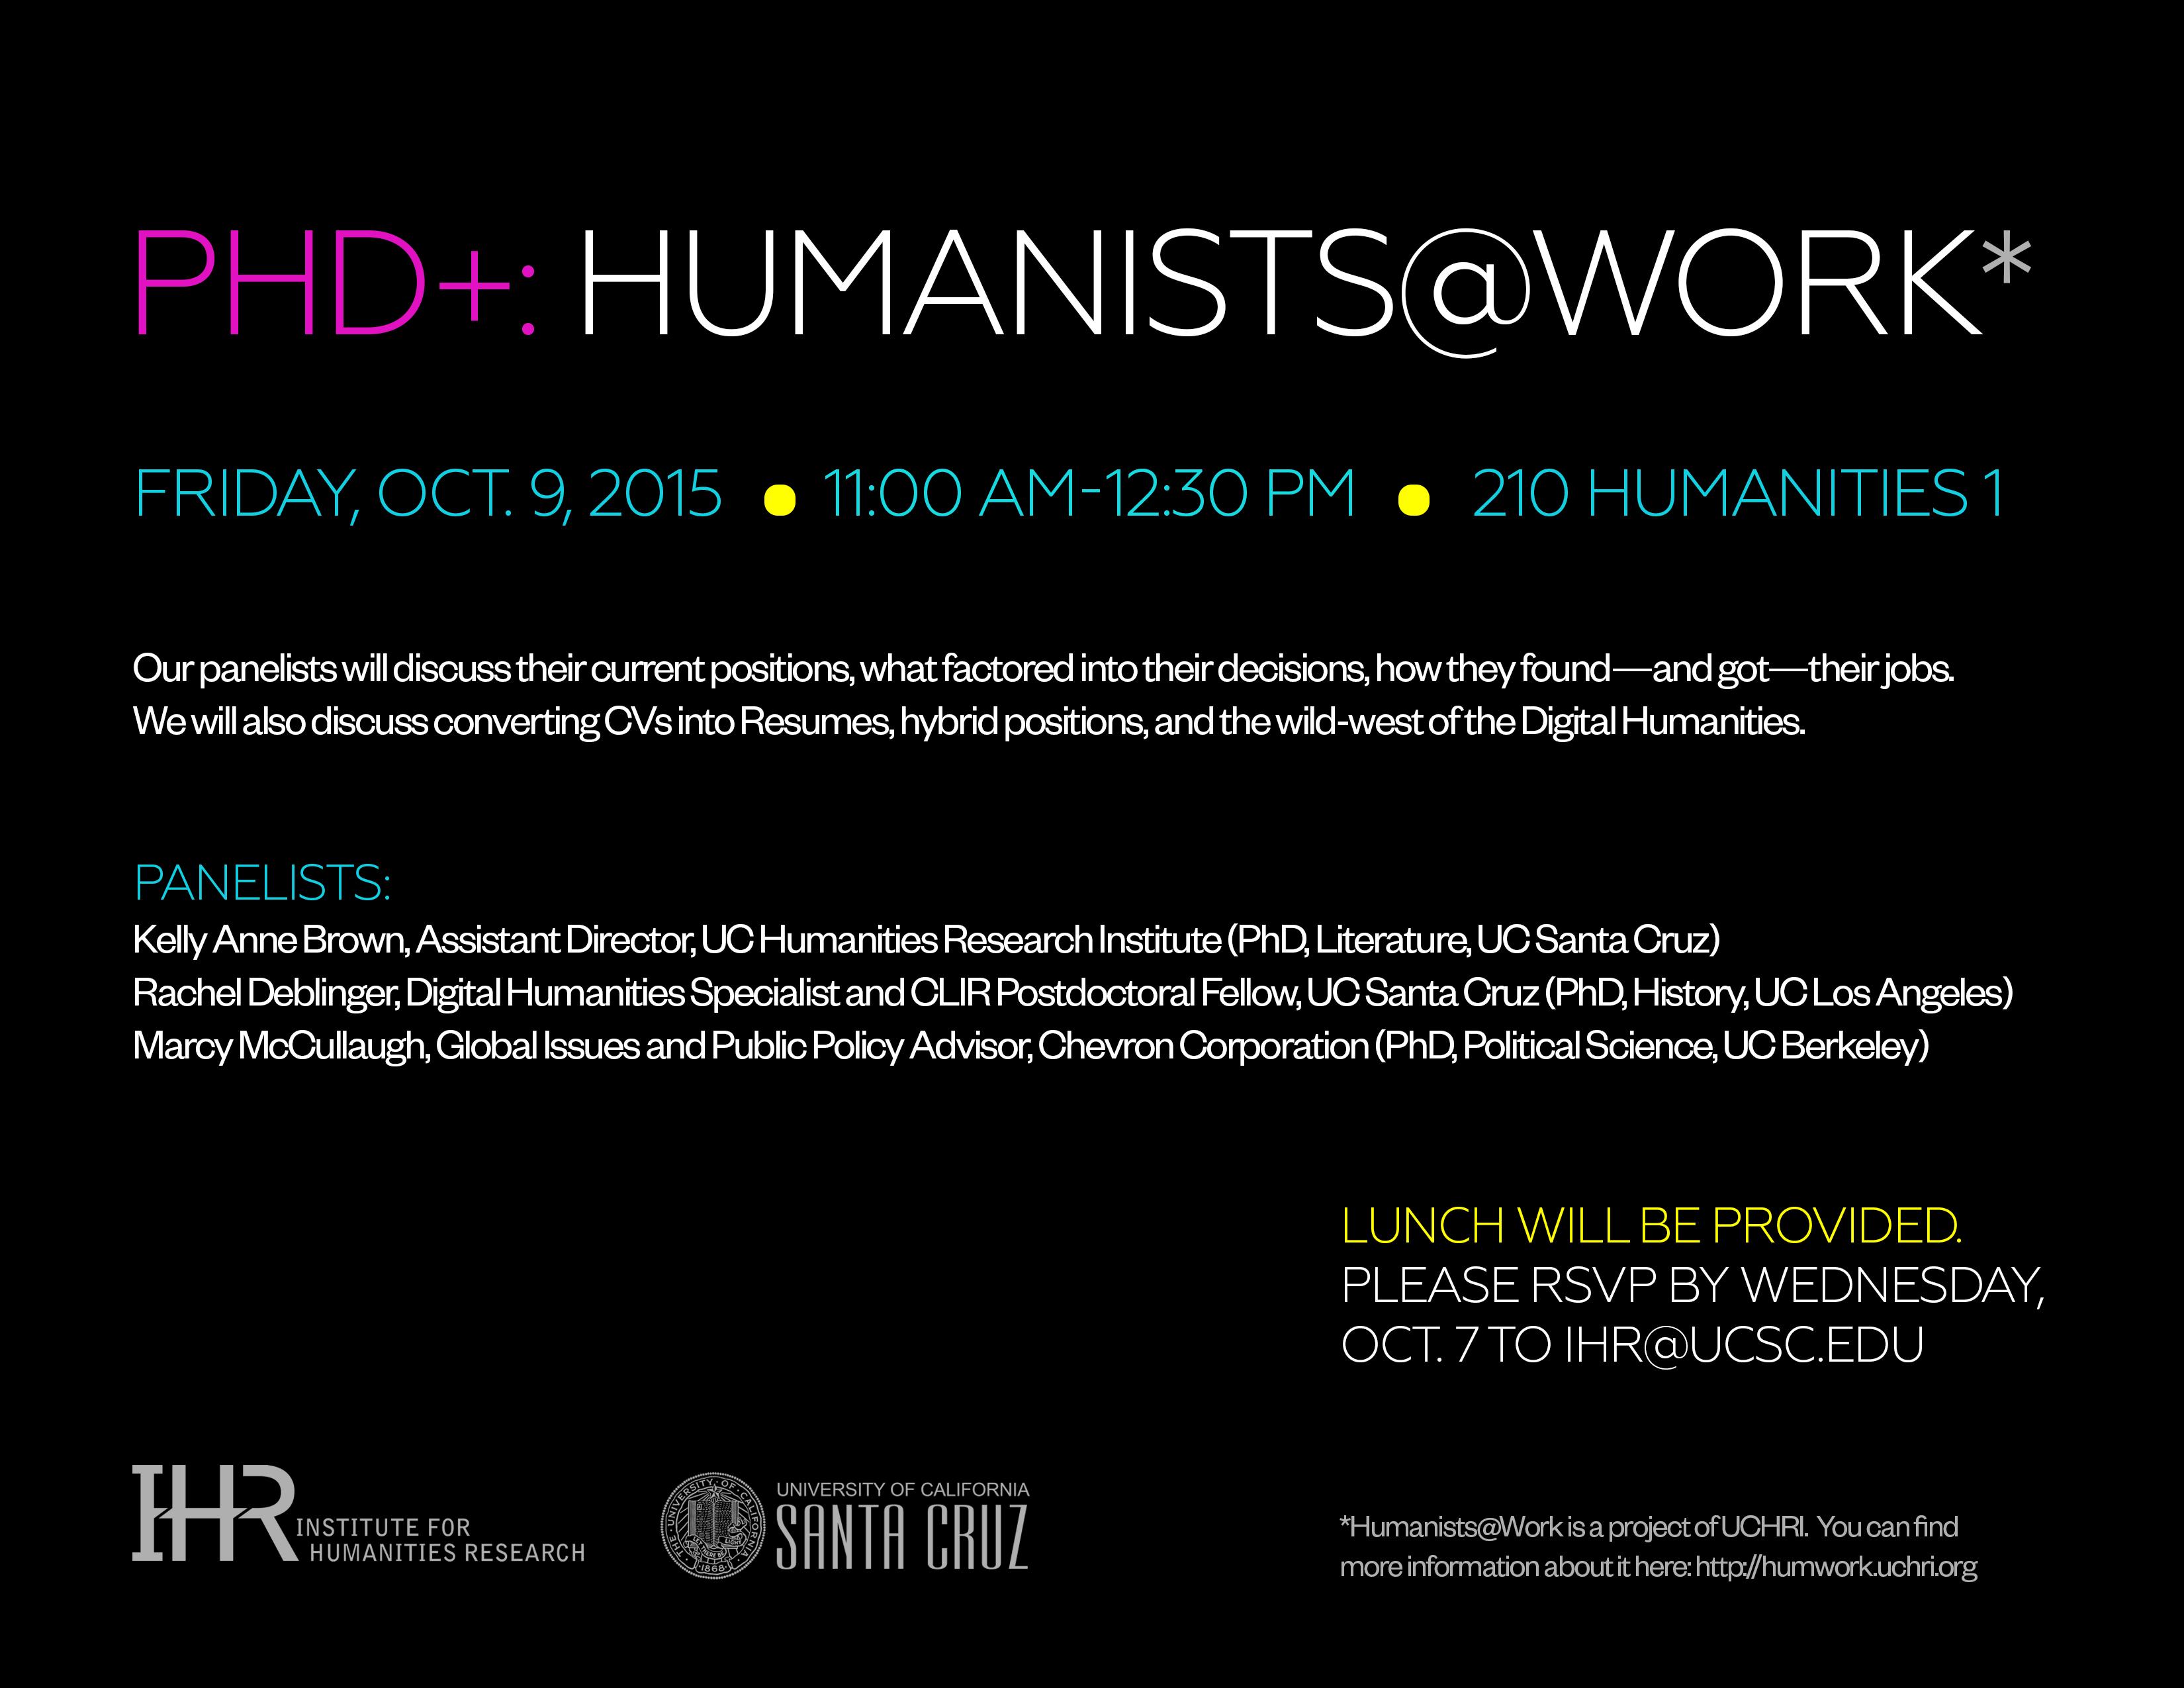 Humanists@Work